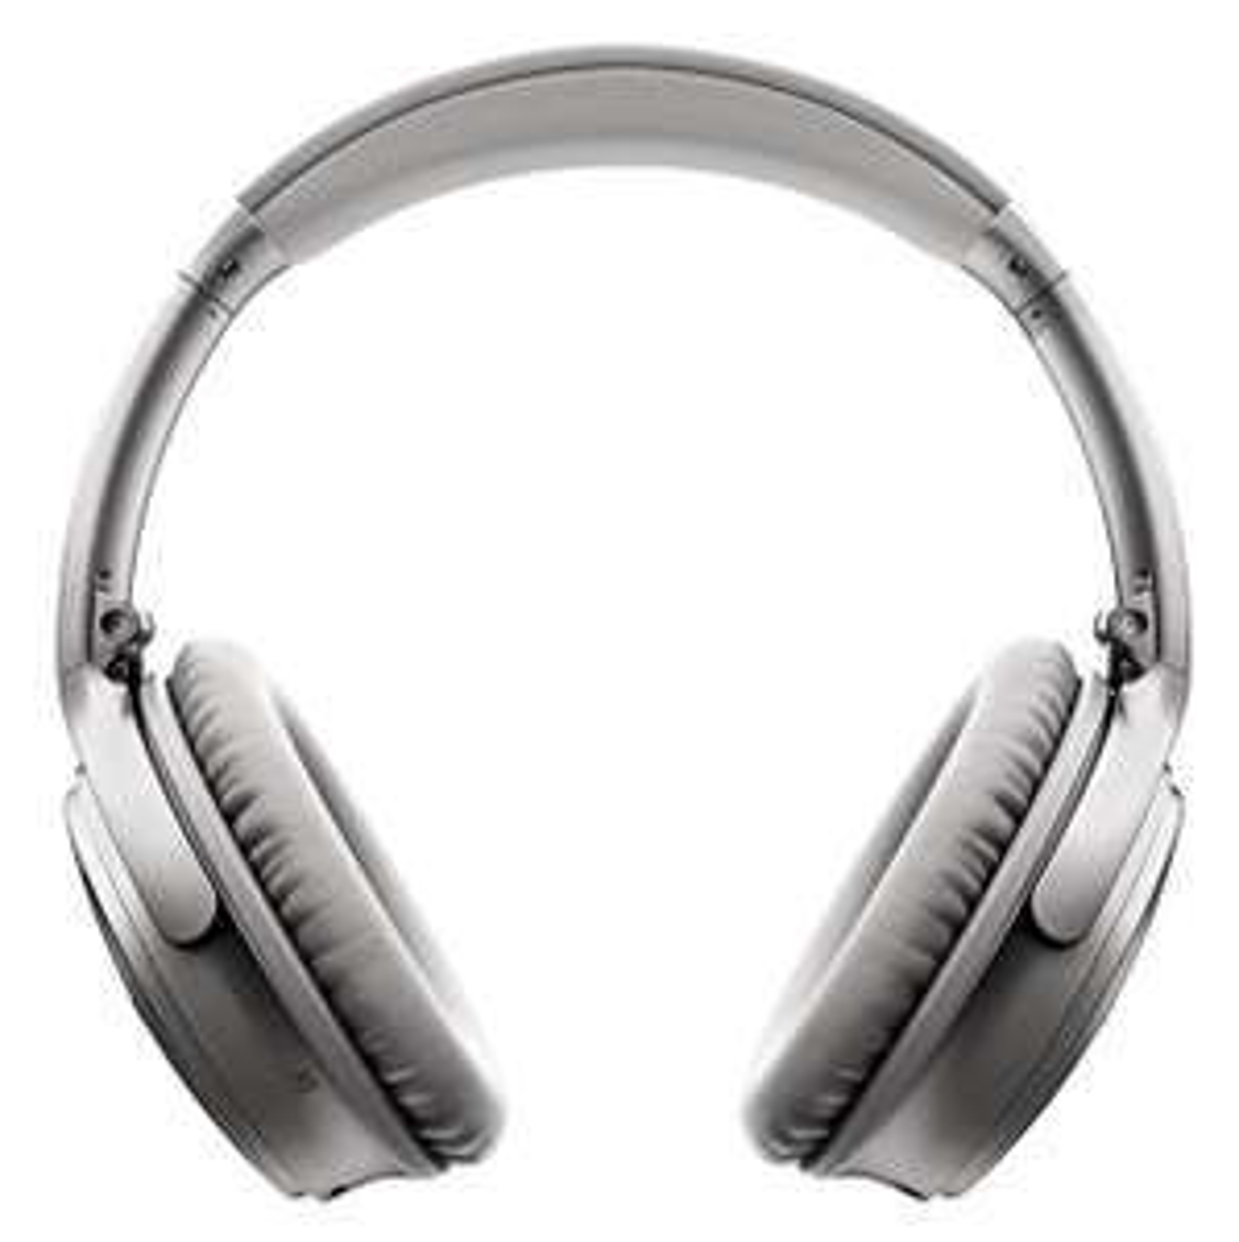 [mediamarkt.de] BOSE Quiet Comfort 35 Bluetooth Wireless Kopfhörer Silber 288,95 €